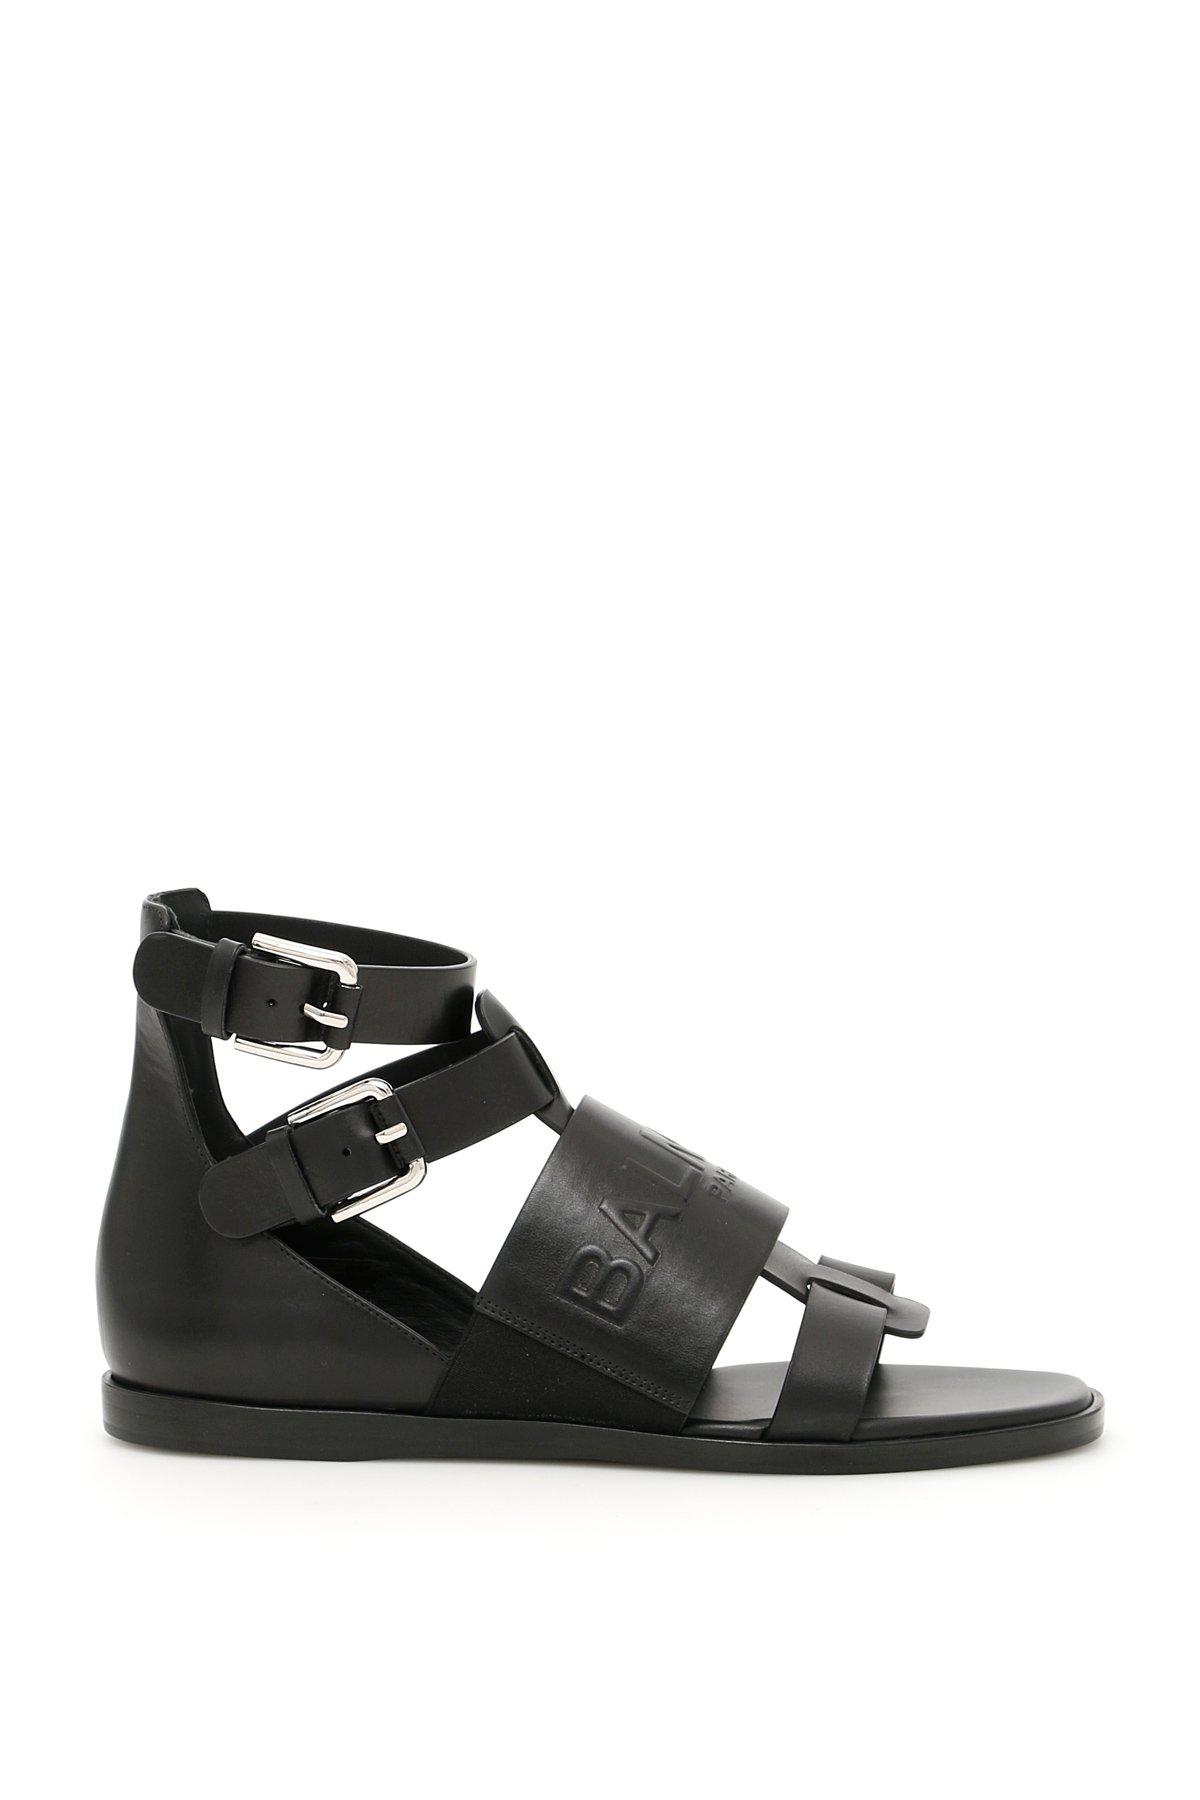 Sandales En Cuir Gaufré Logo-noir - Balmain XKGP5ui